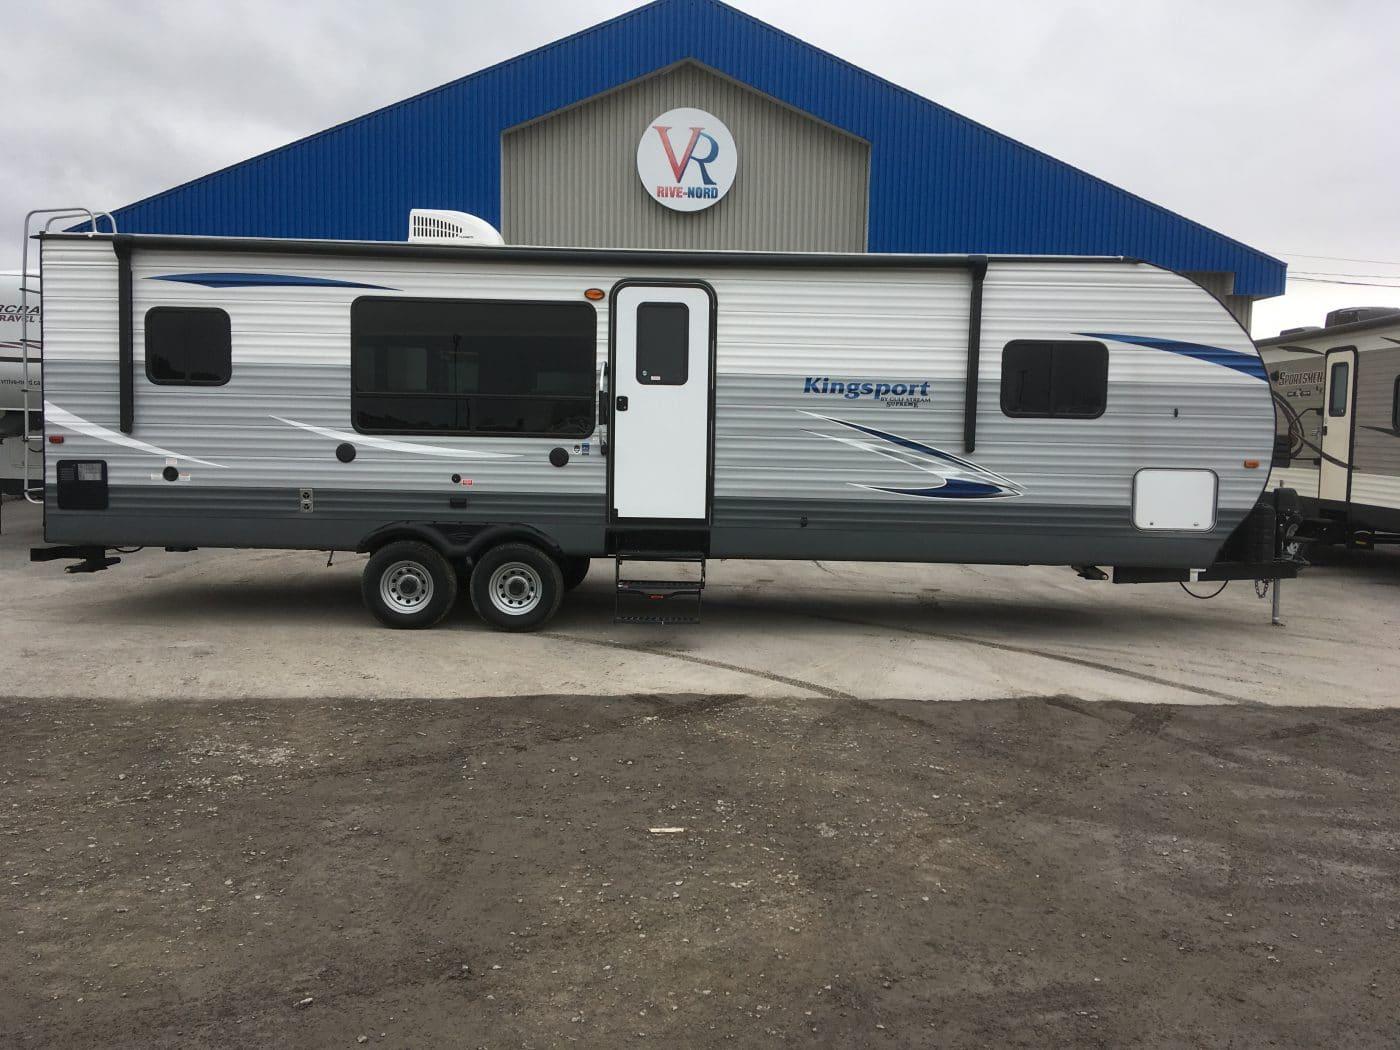 http://www.campingatlantide.com/wp-content/uploads/2018/12/kingsport-exterieur-1.jpg